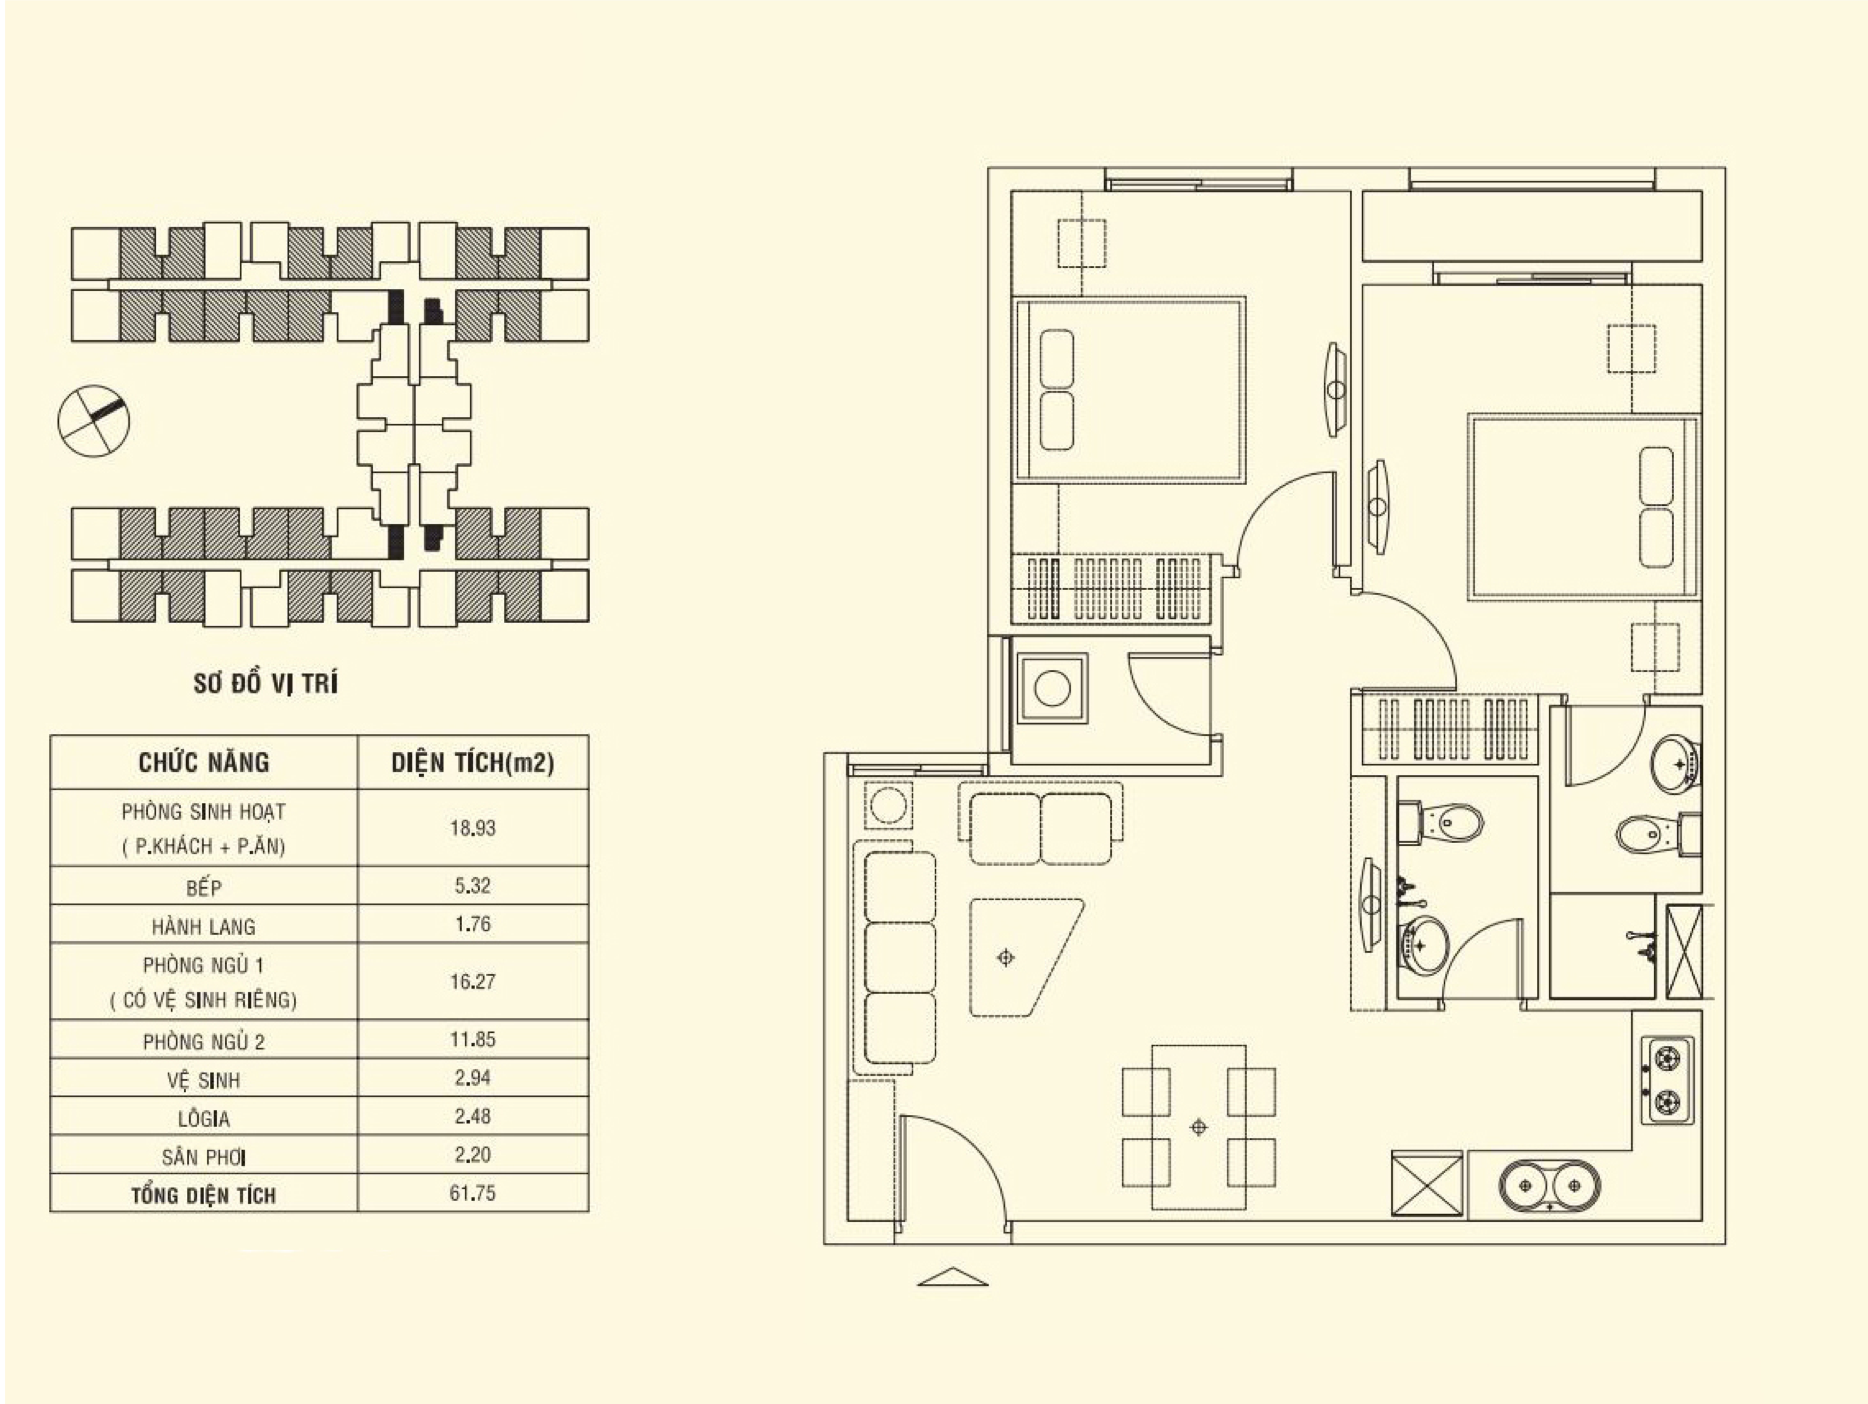 Thiết kế căn 61.75 m2